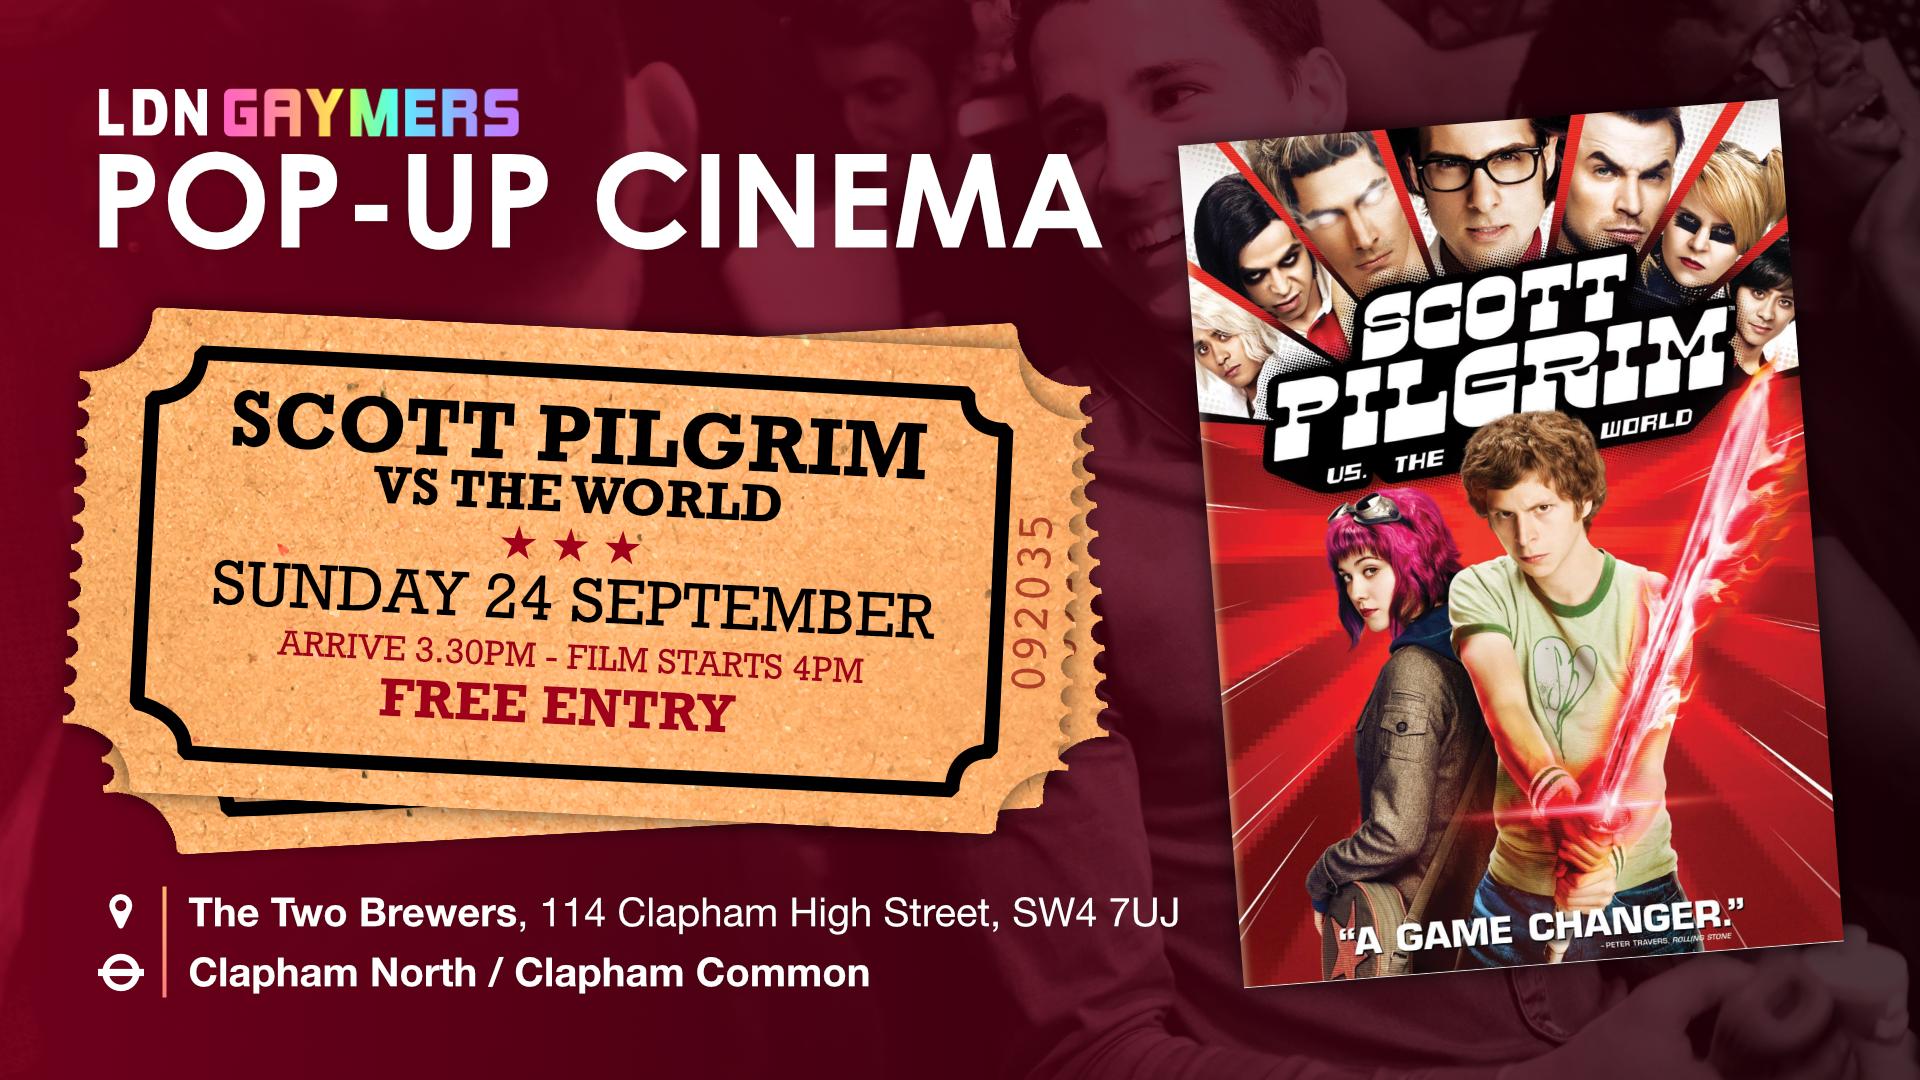 LDN Gaymers Pop-up Cinema - Scott Pilgrim vs The World